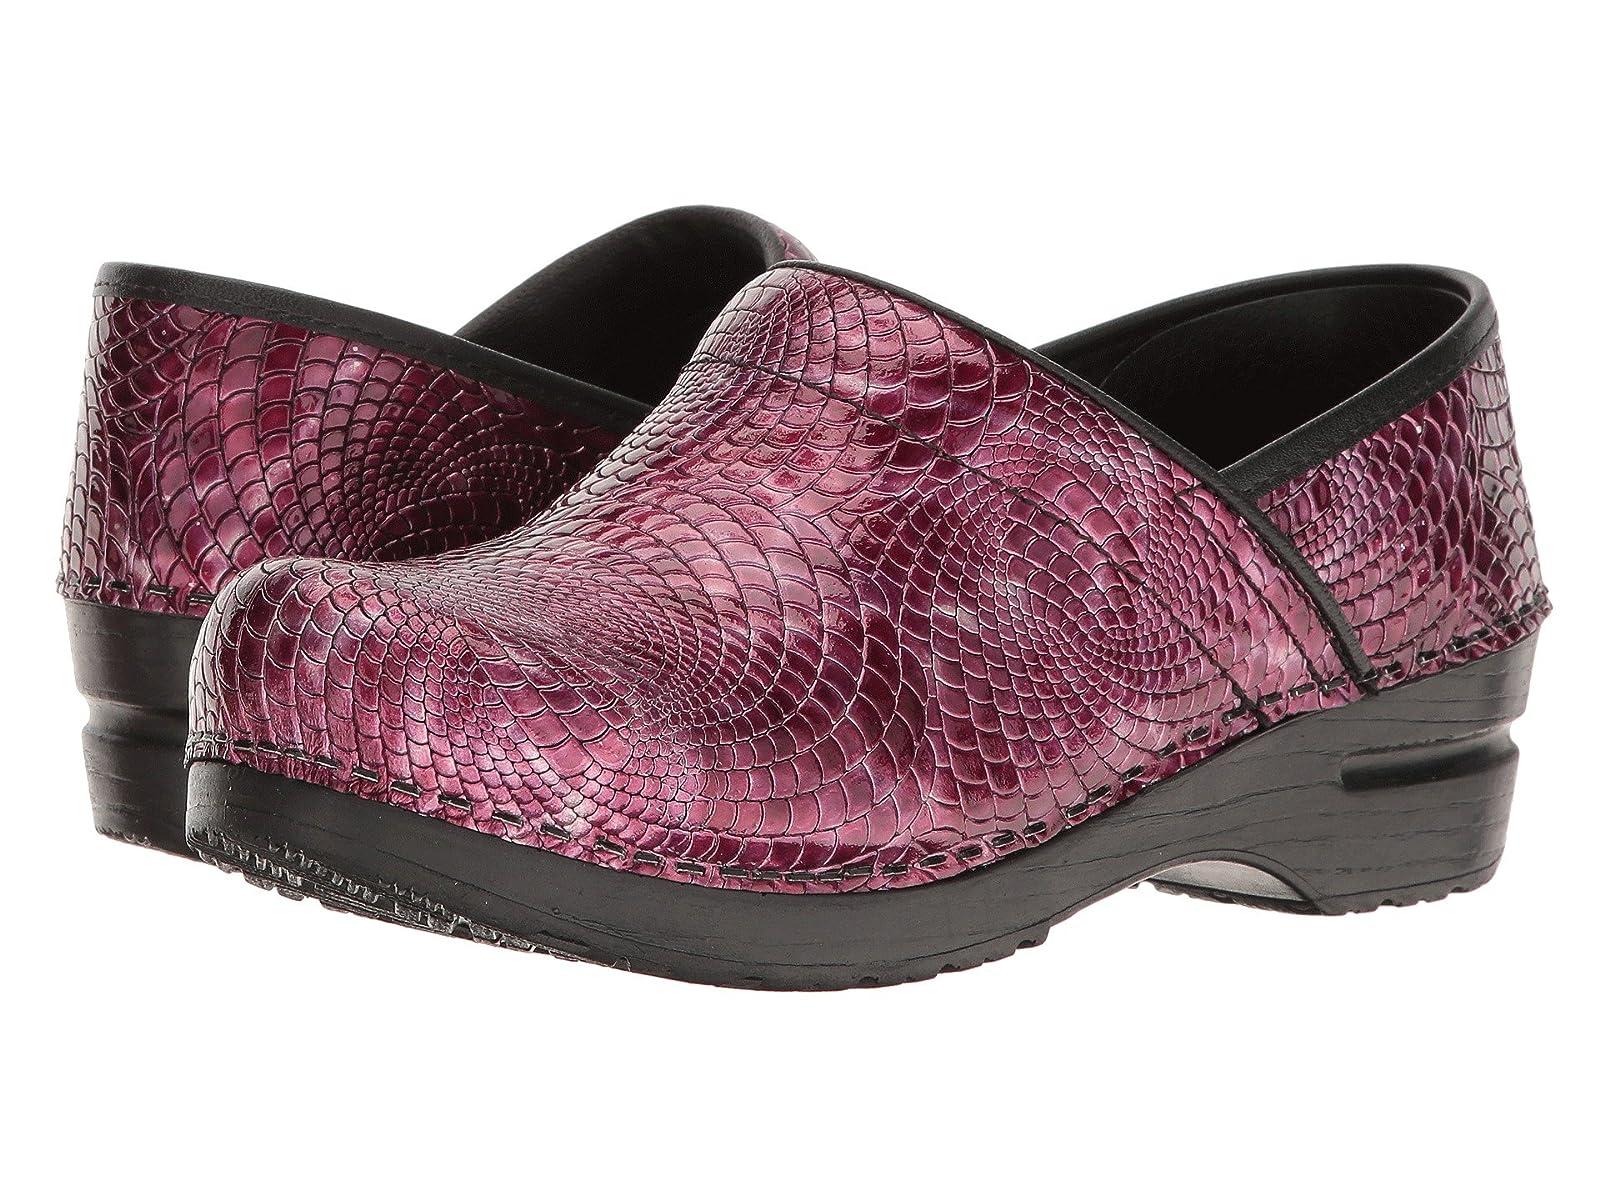 Sanita Original Professional PheobeCheap and distinctive eye-catching shoes